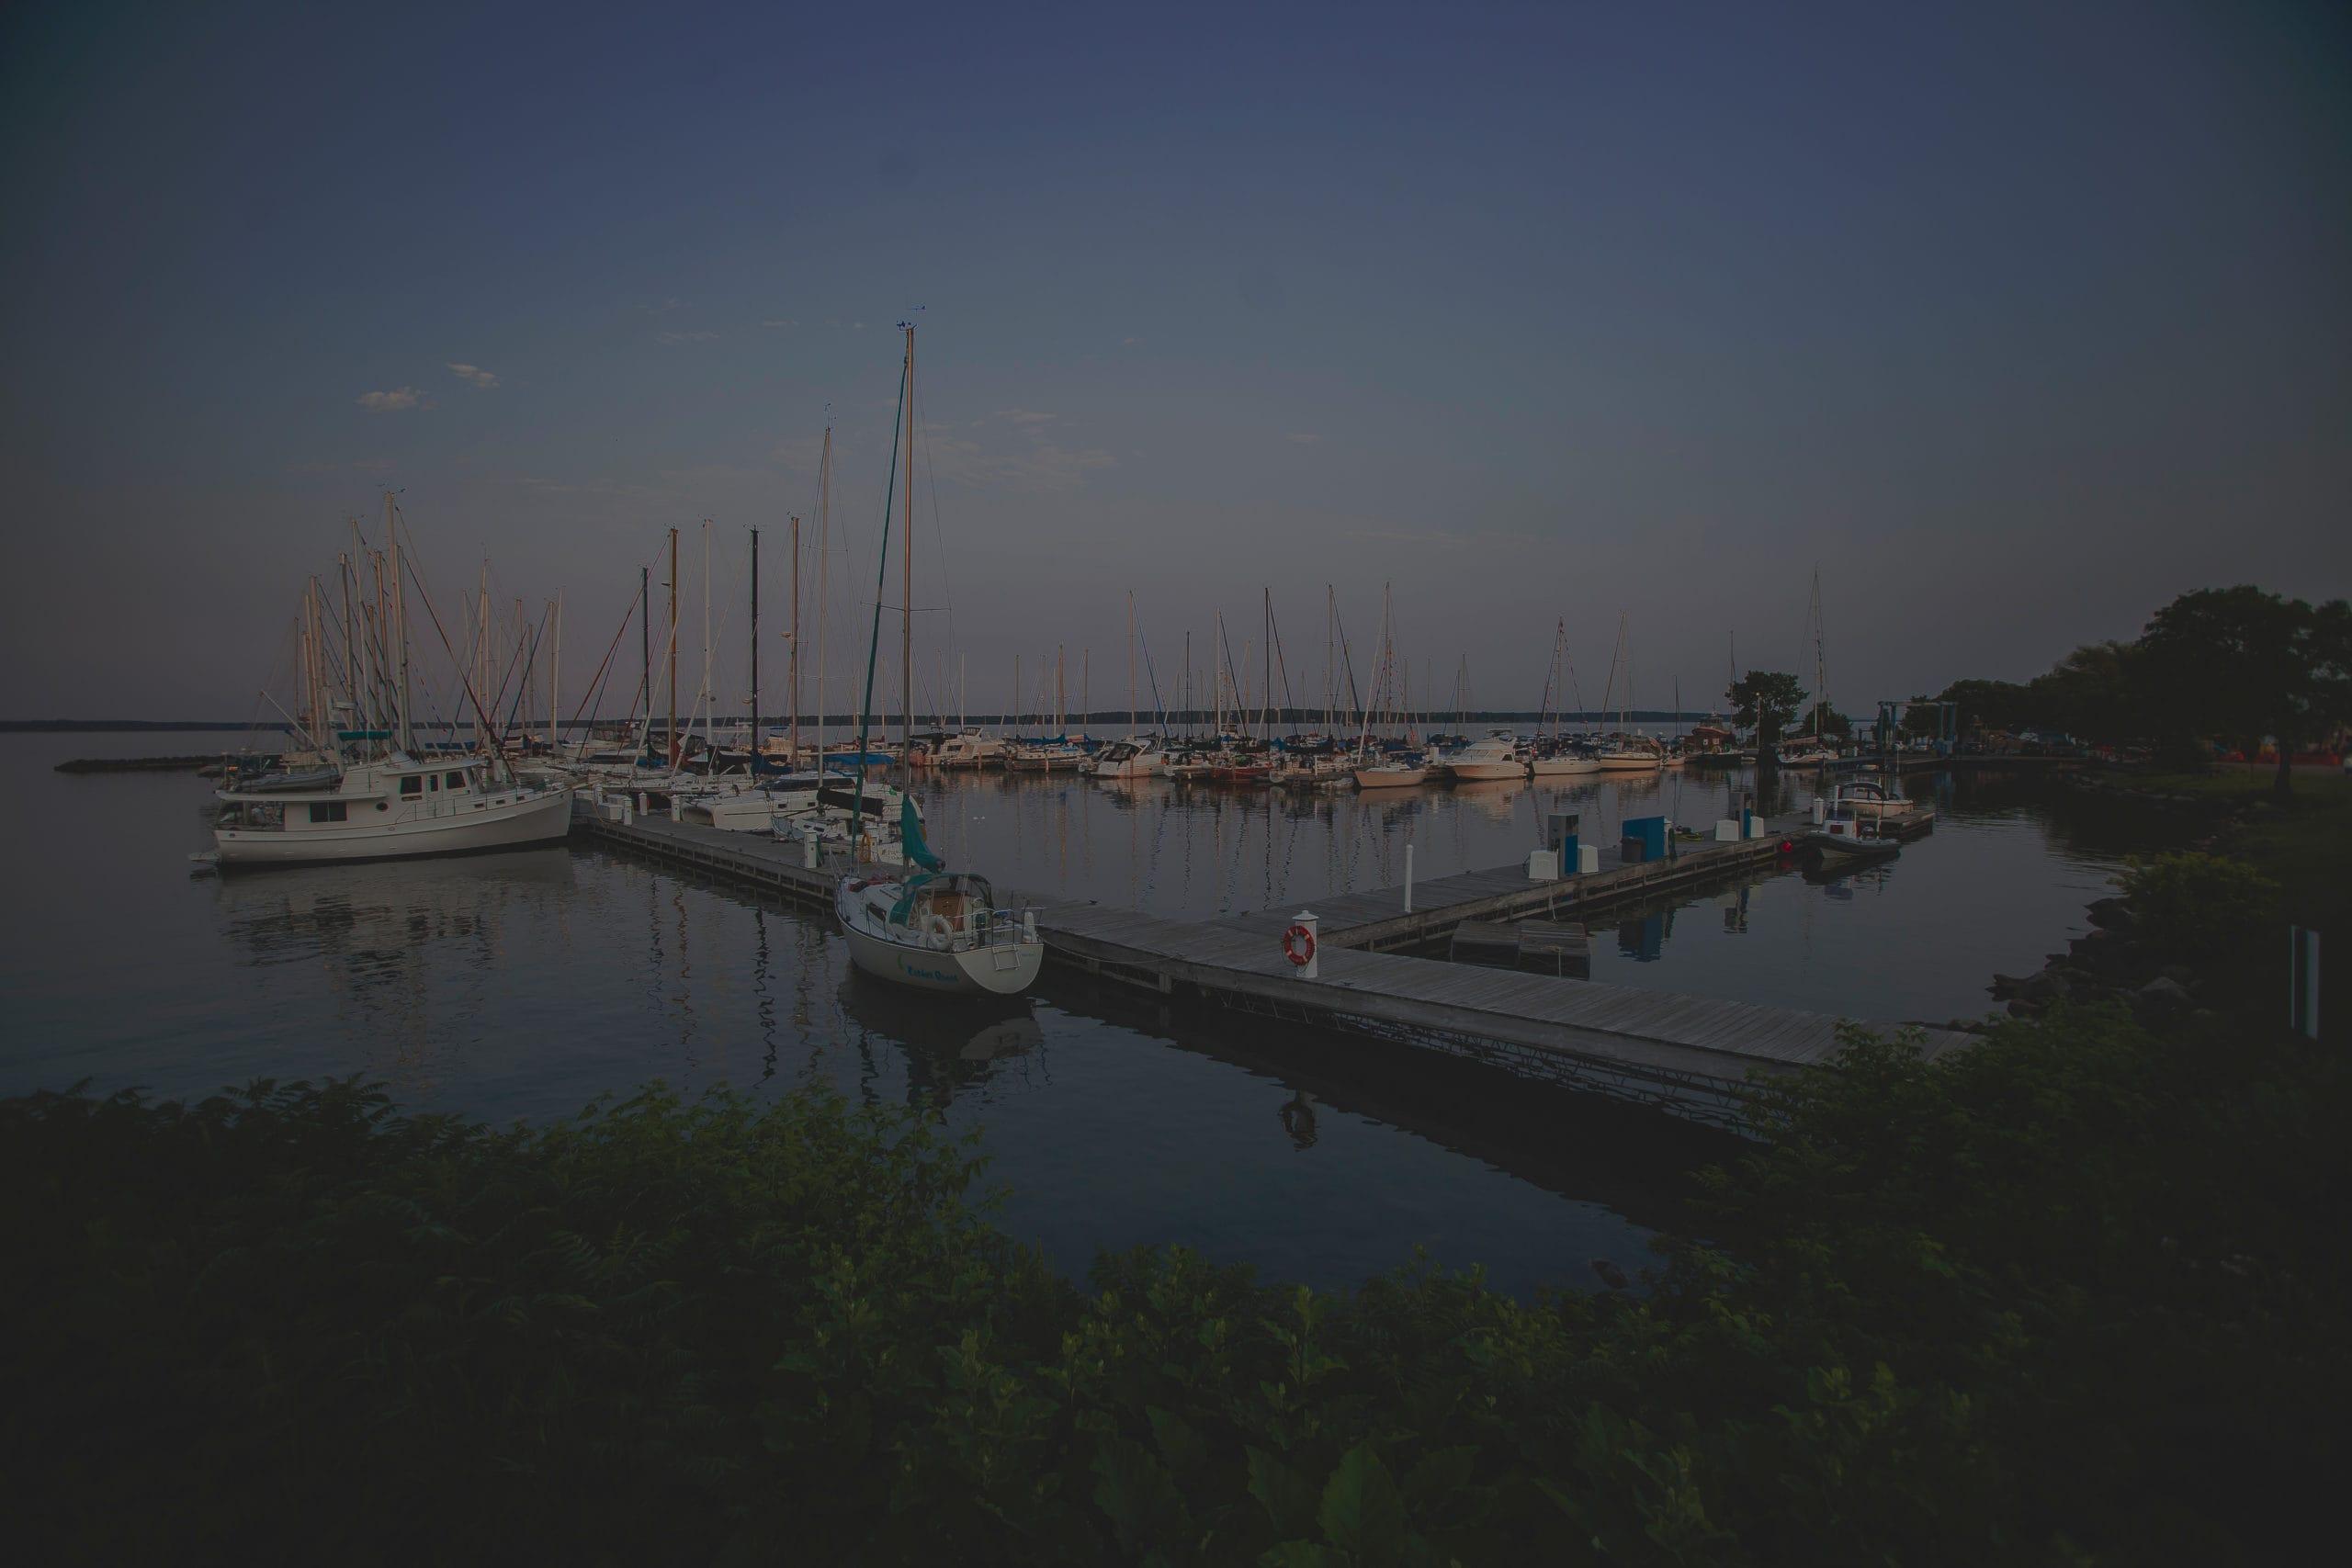 bayfield, wi harbor